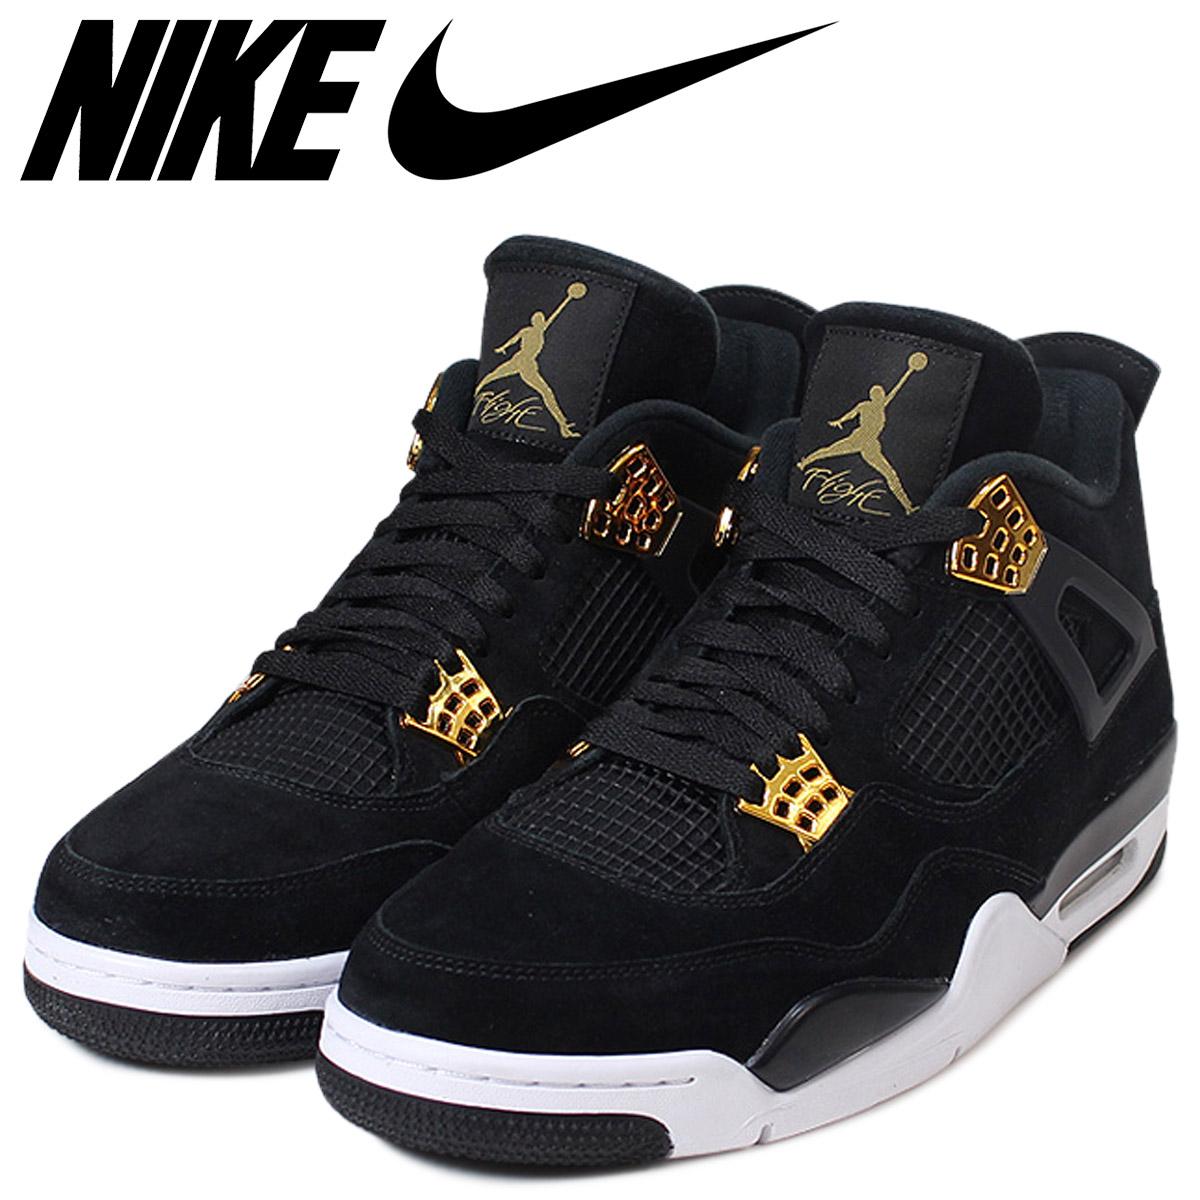 new styles 09978 49a7b ... discount nike nike air jordan 4 nostalgic royalty sneakers air jordan 4  retro royalty men 308497